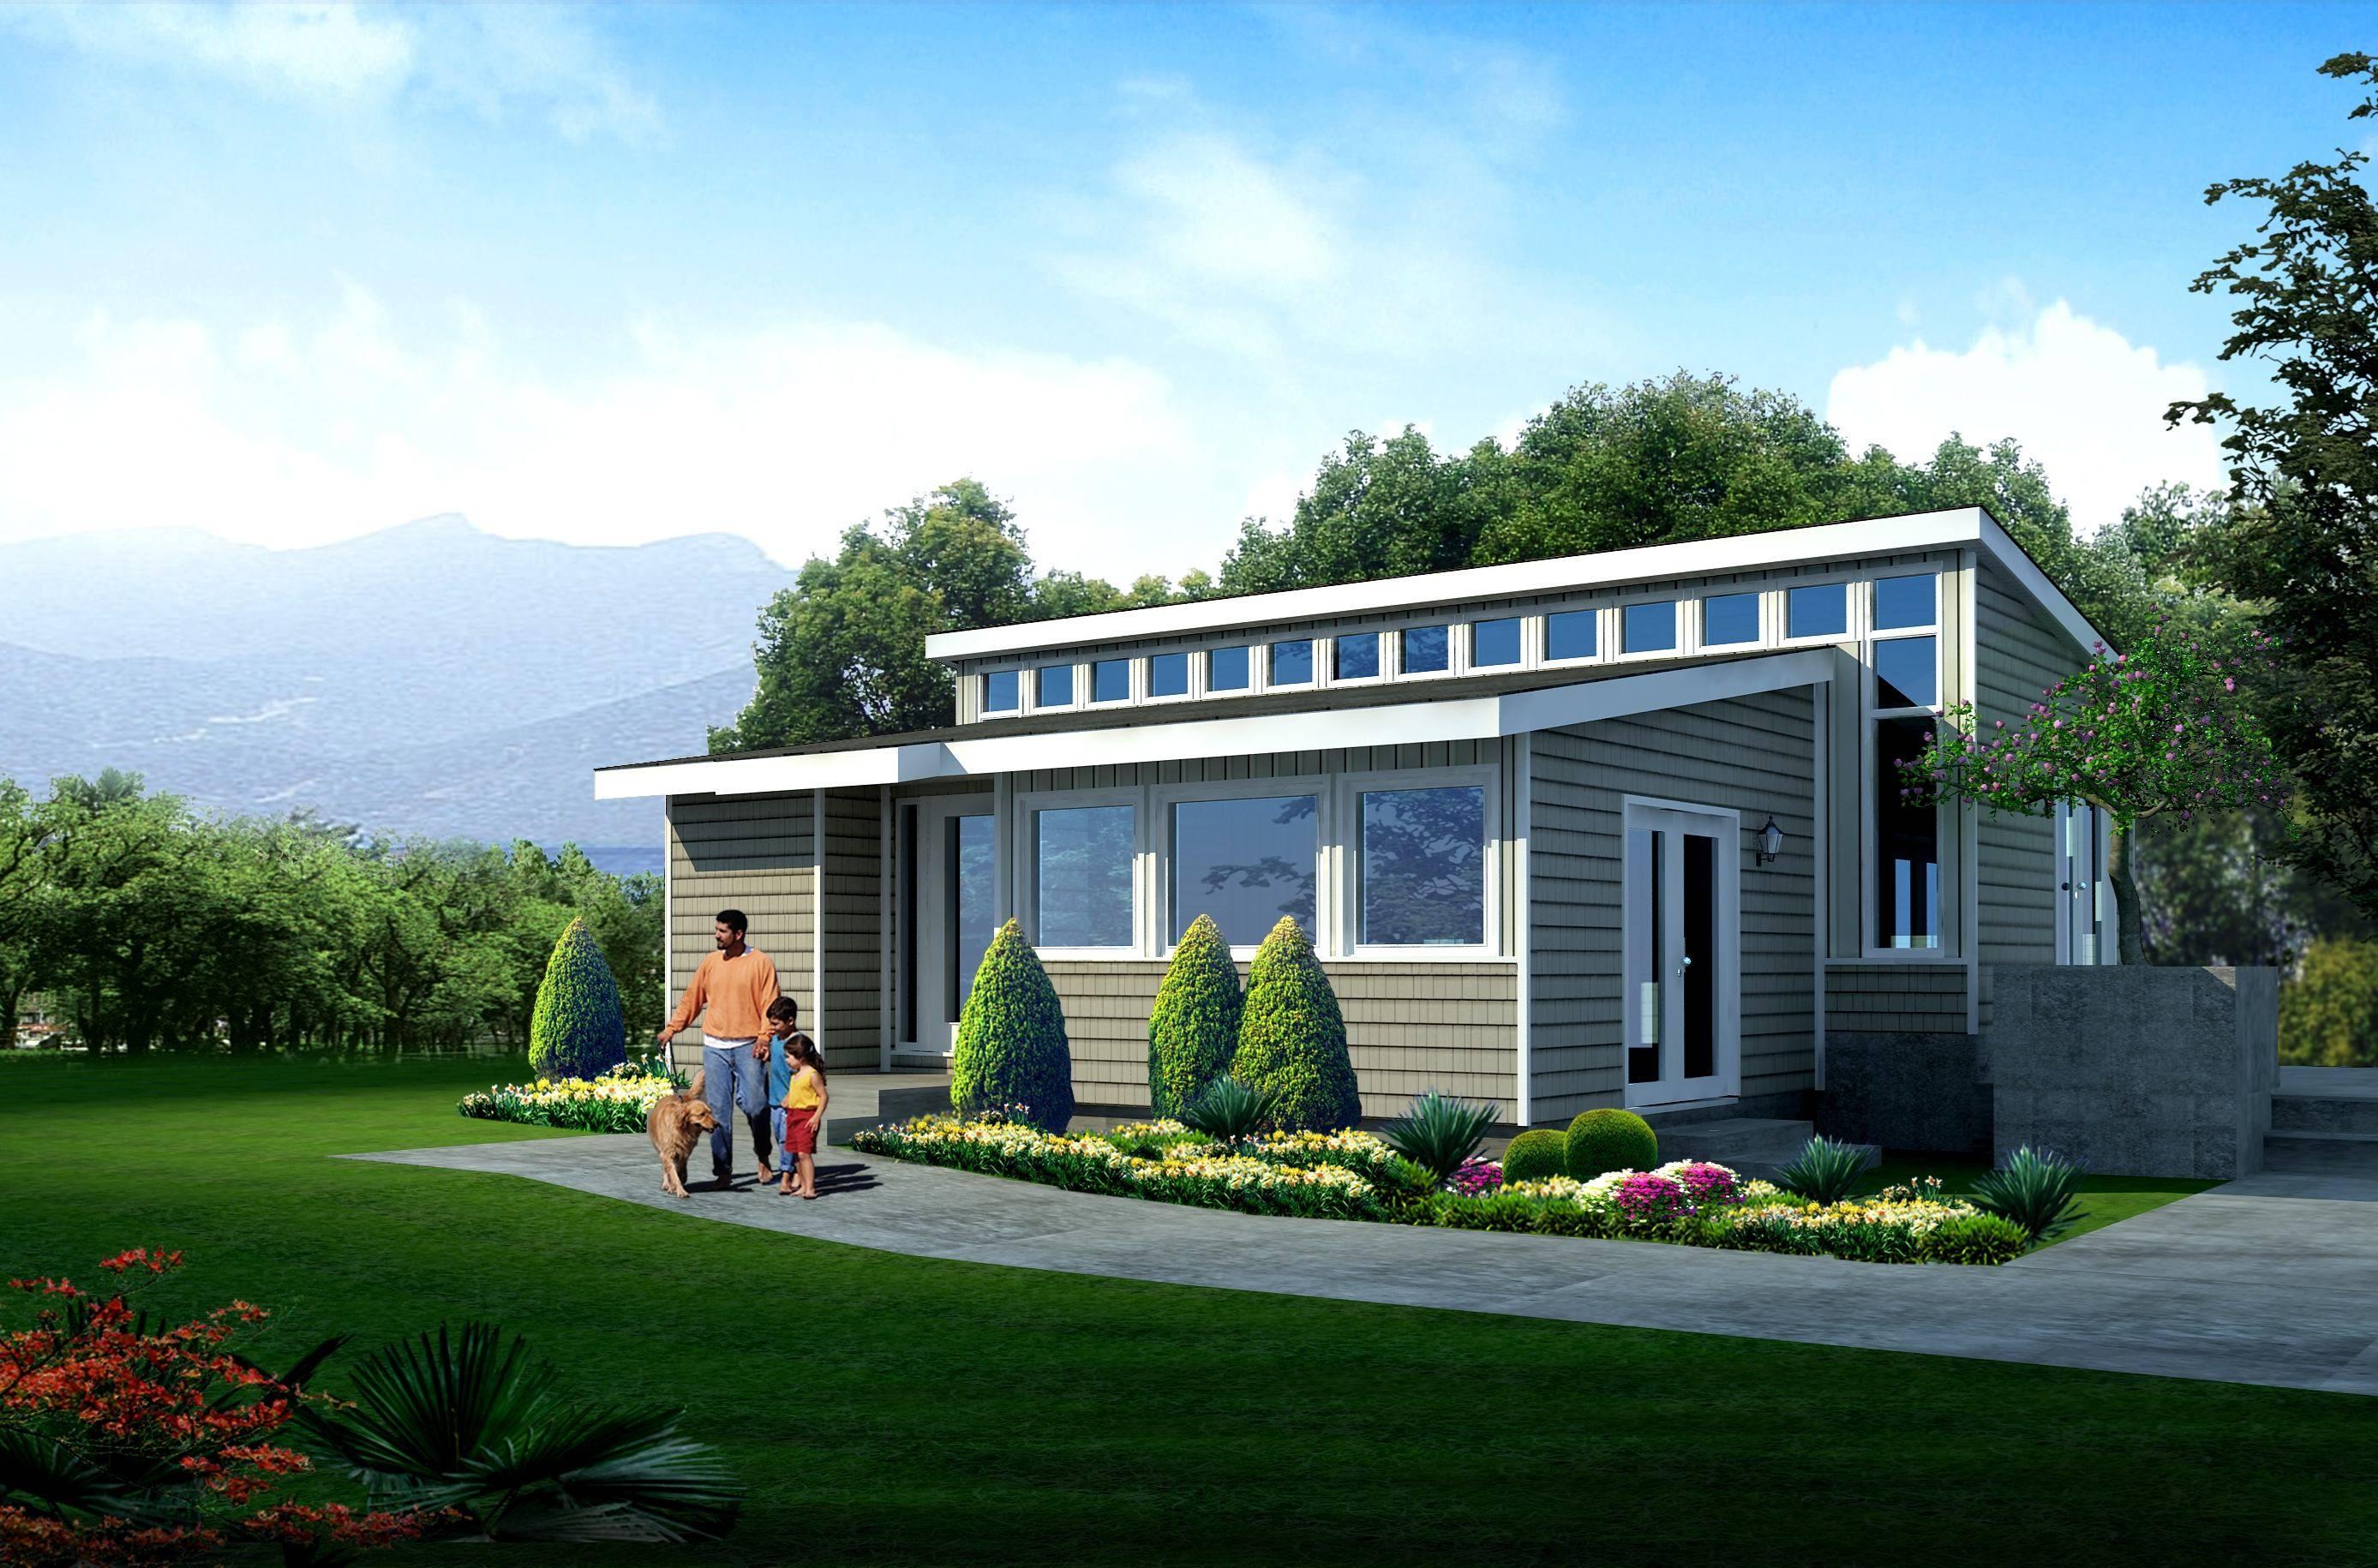 Cheap Prefab Homes Ontario Low Cost Portable Cheap Prefab Homes - Best modern prefab homes